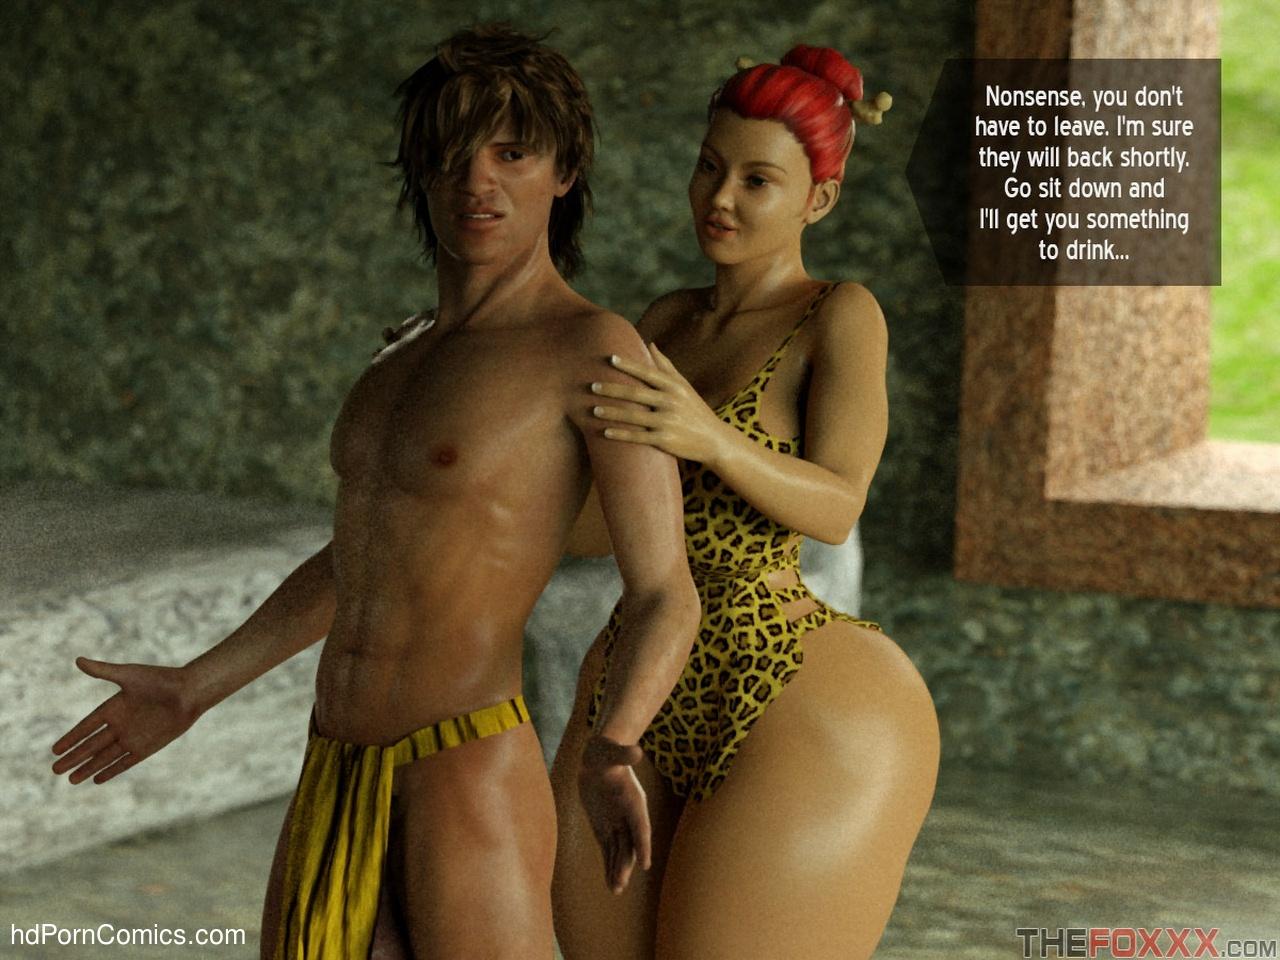 Cavevixens-16 free sex comic